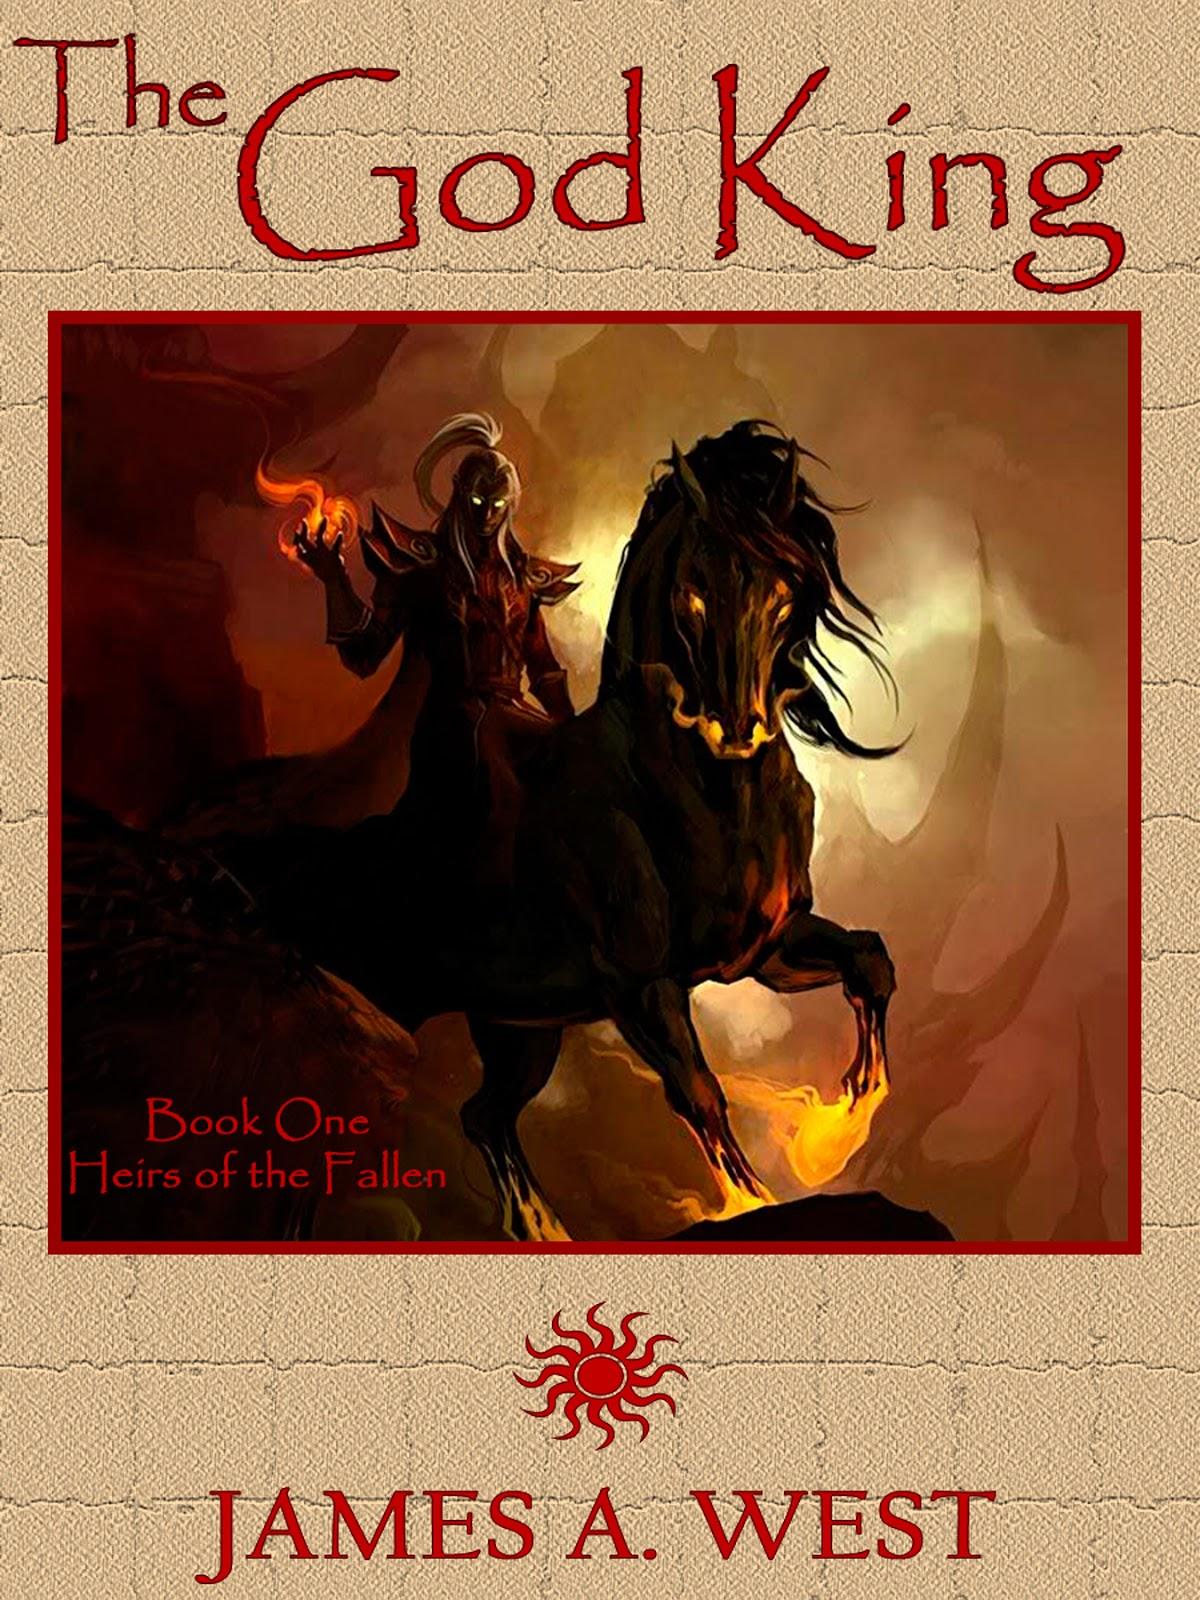 http://2.bp.blogspot.com/-PsrOuxAdnjc/UIW-zrFur0I/AAAAAAAAA4w/ypir5av-EMQ/s1600/new+god+king+cover+300+large.jpg